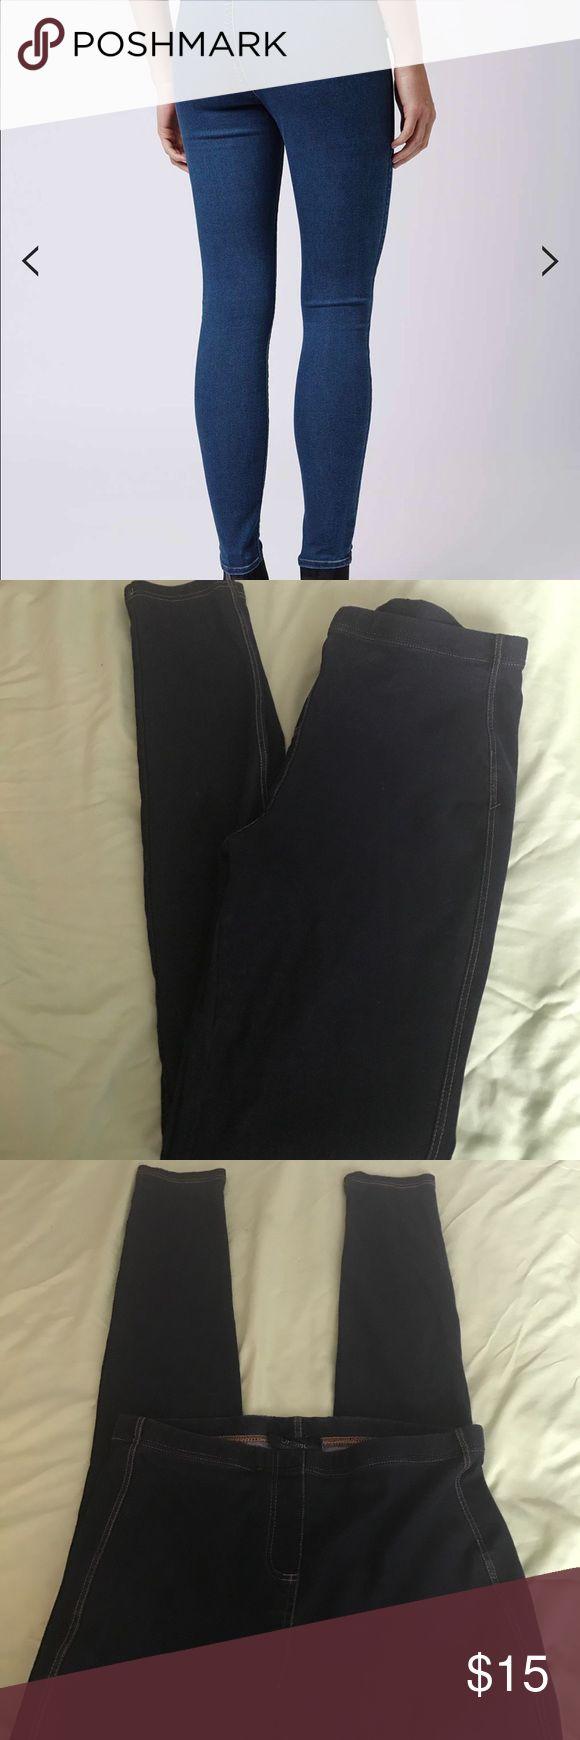 Topshop Topshop legging size 8 in good condition Topshop Pants Leggings